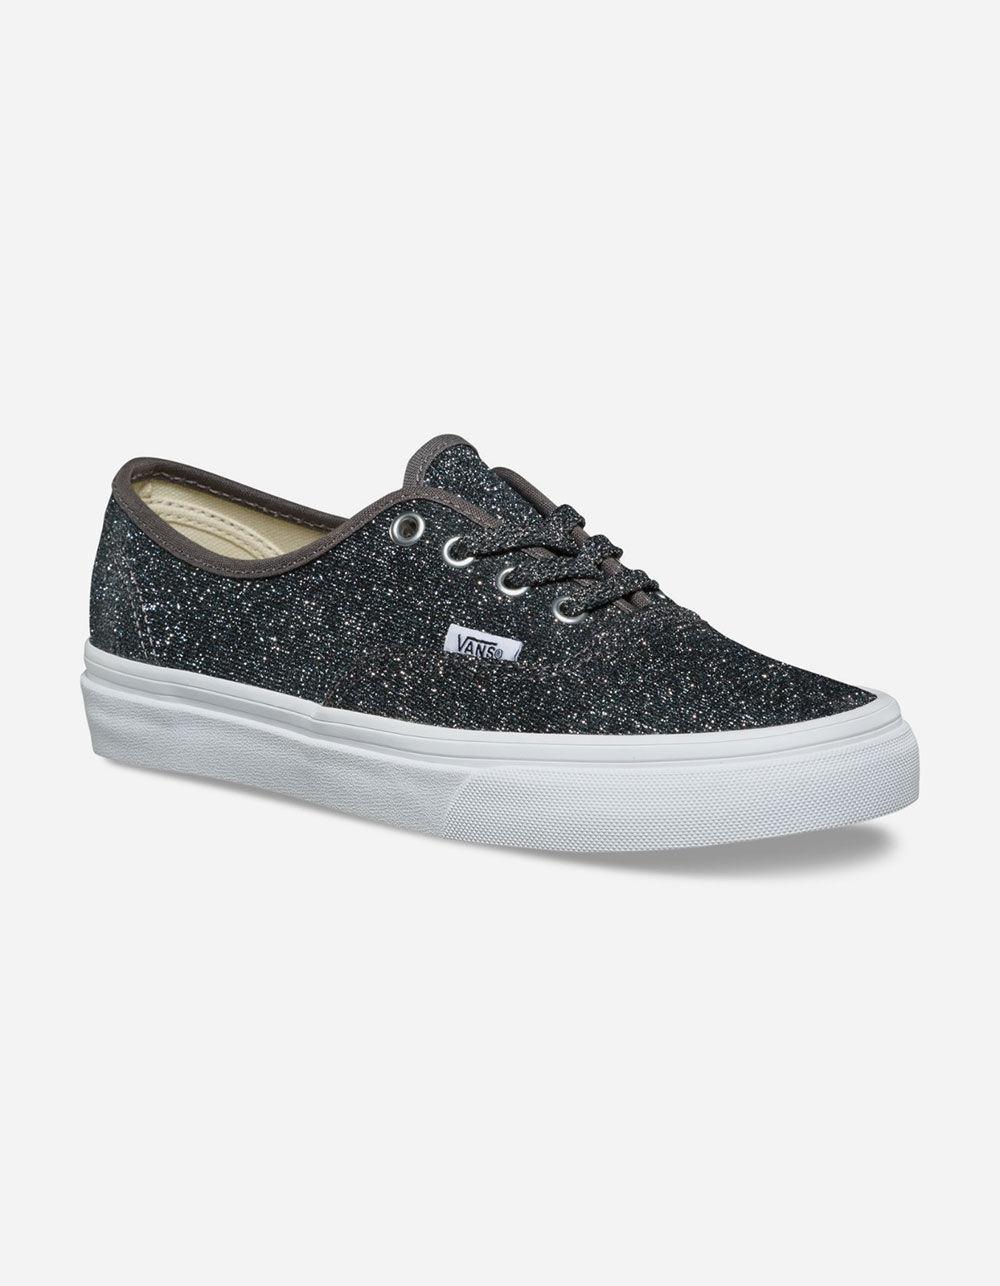 523fea2b2007 Lyst - Vans Lurex Glitter Authentic Black   True White Womens Shoes in Black